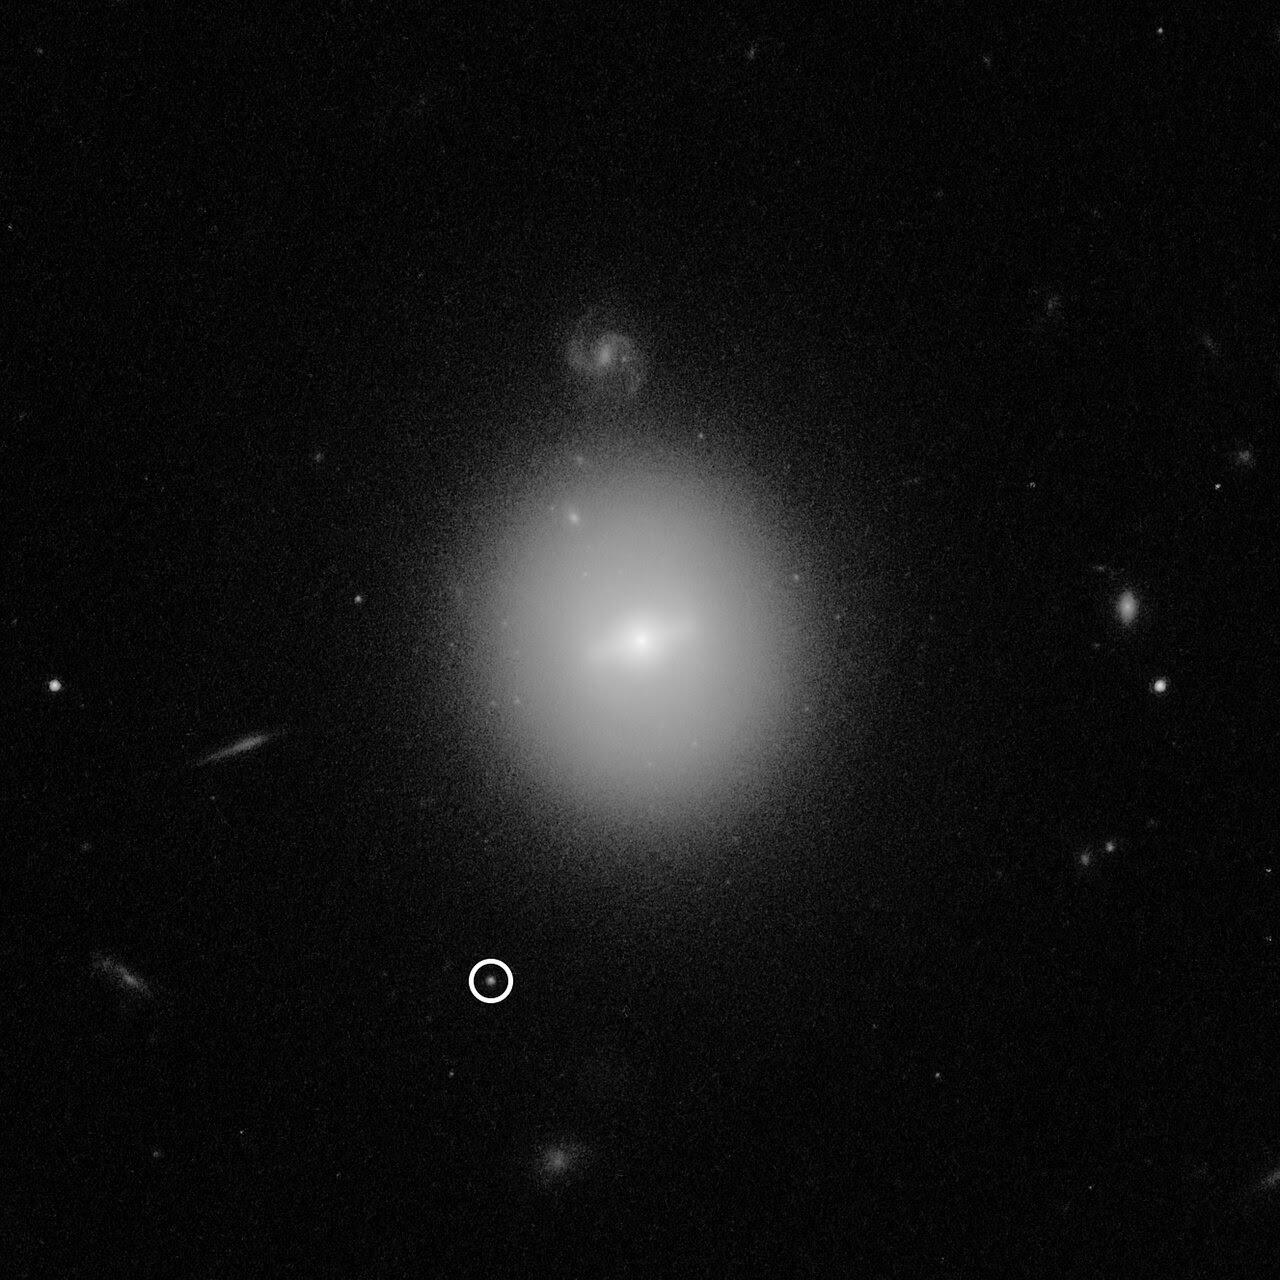 Hubble Observation Of Intermediate Mass Black Hole Esa Hubble